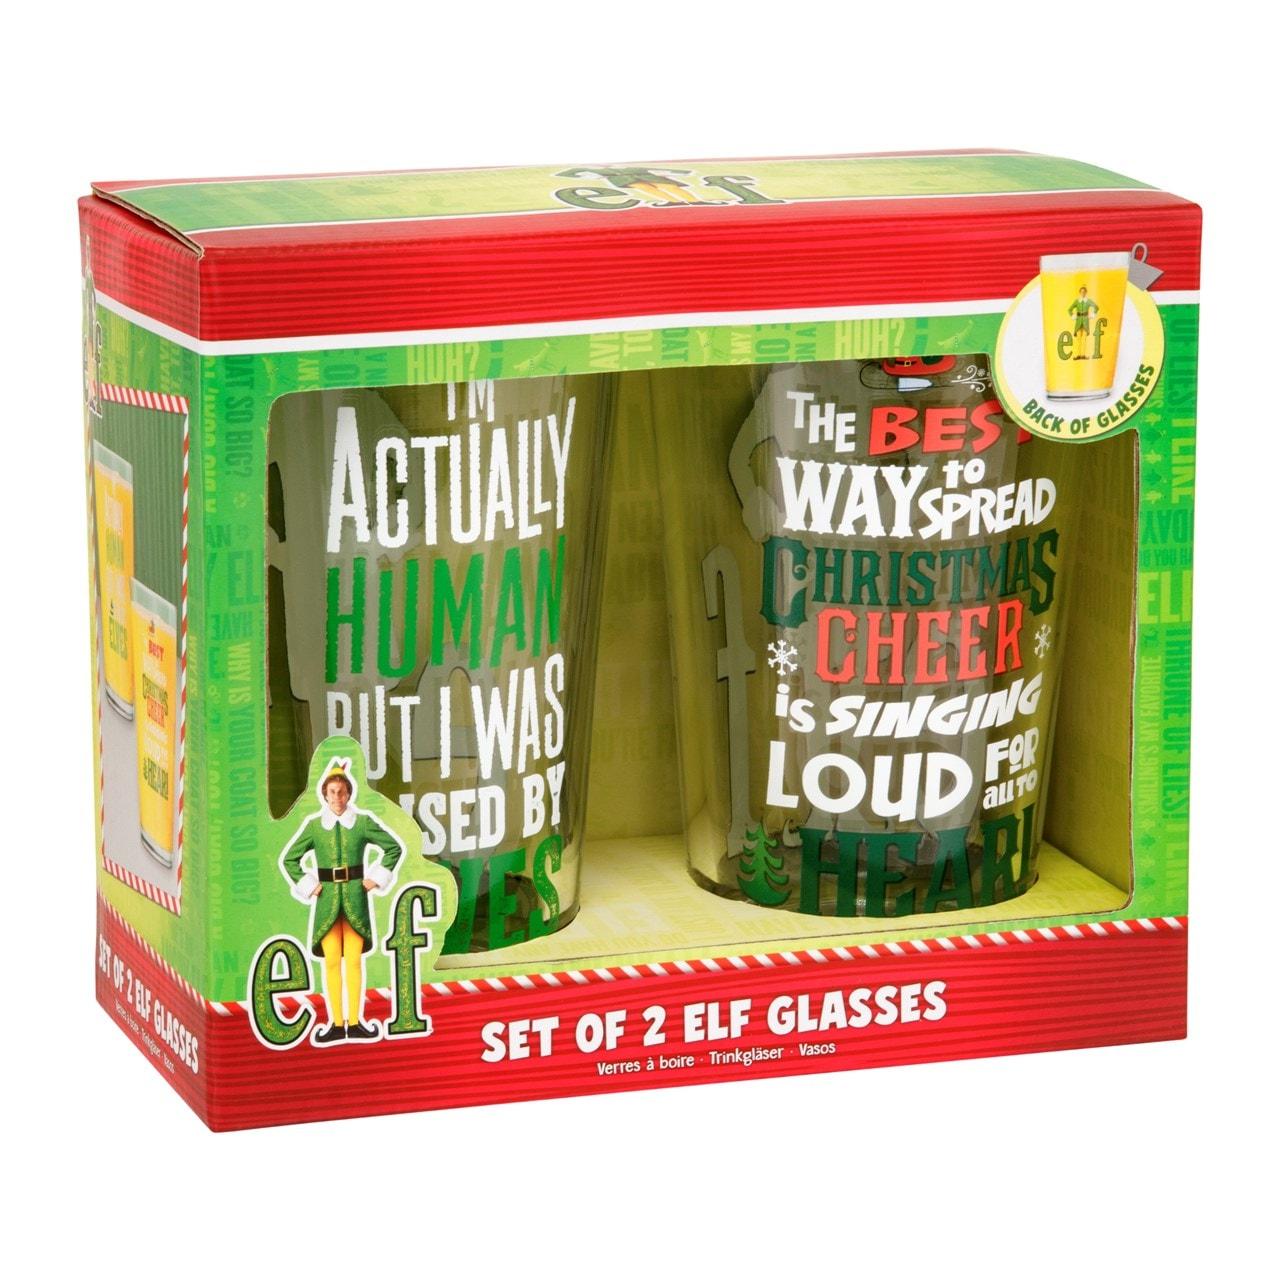 Set of 2 Elf Glasses: Large Glass Gift Set - 1